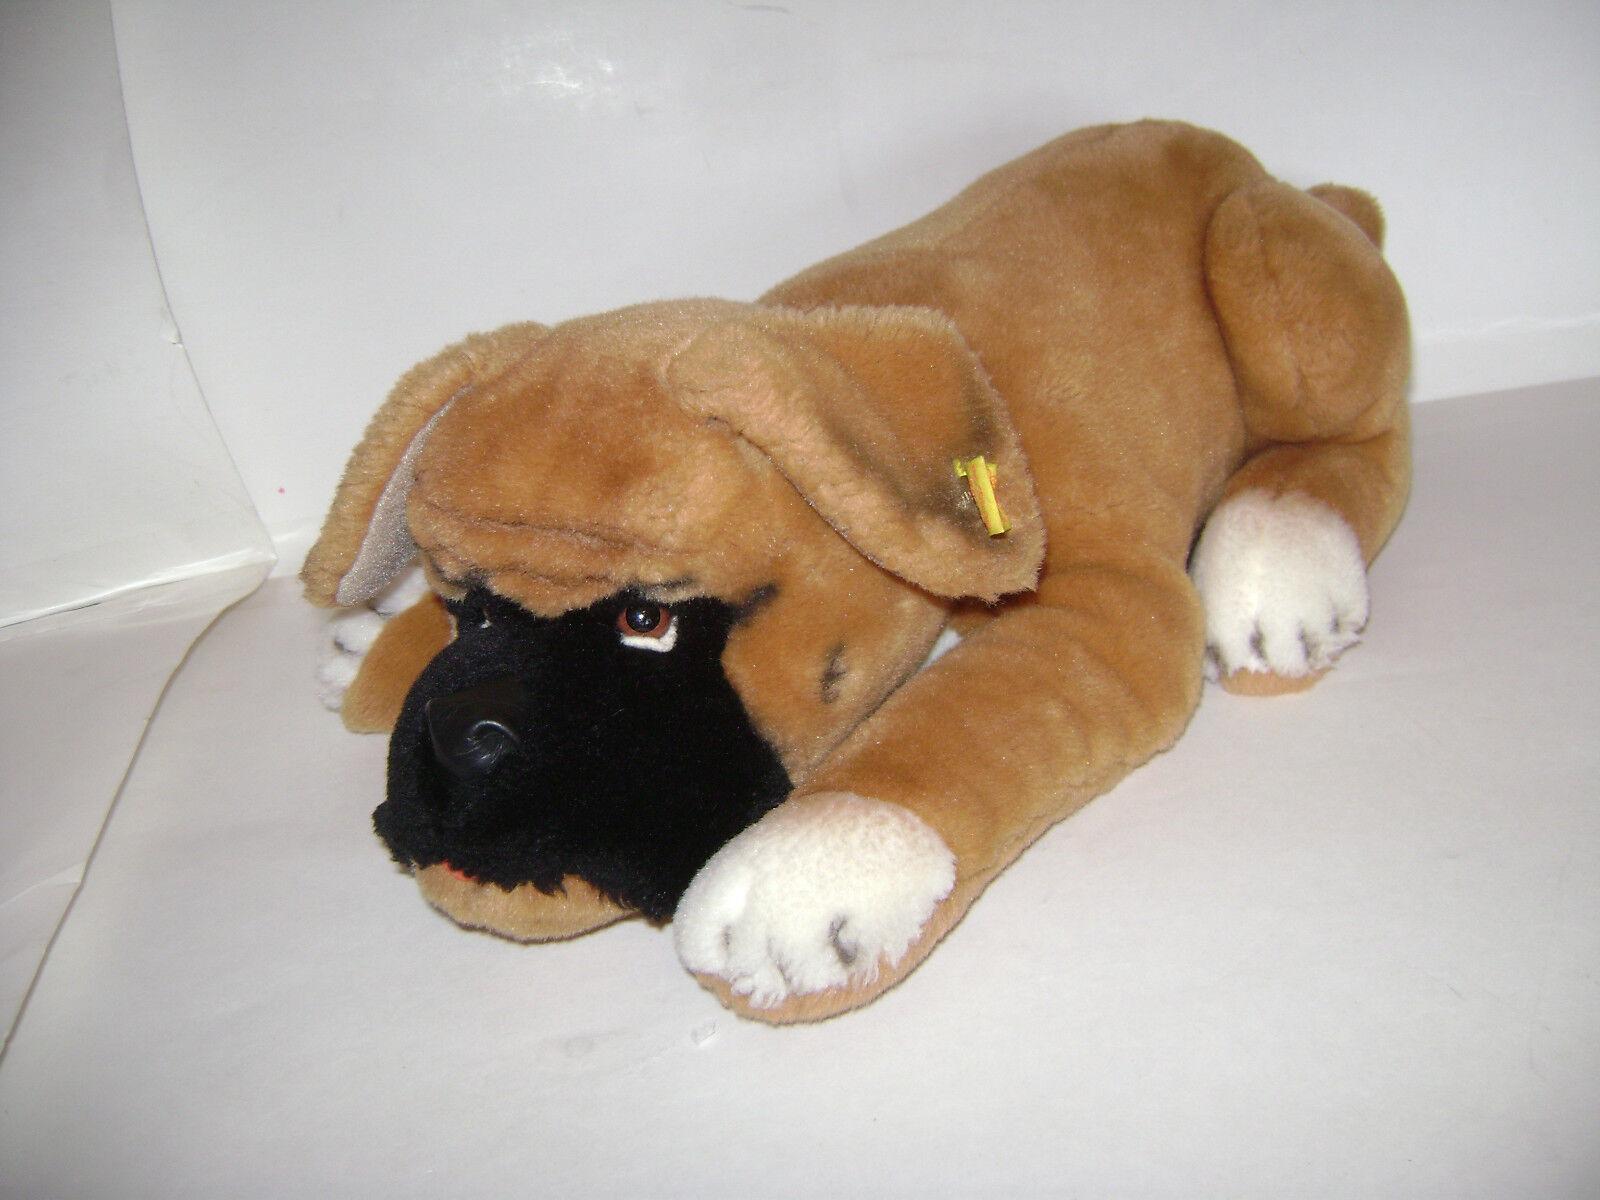 STEIFF BOBBY BOXER DOG LAYING DOWN 4045 35 17  PLUSH STUFFED WEST GERMANY RARE